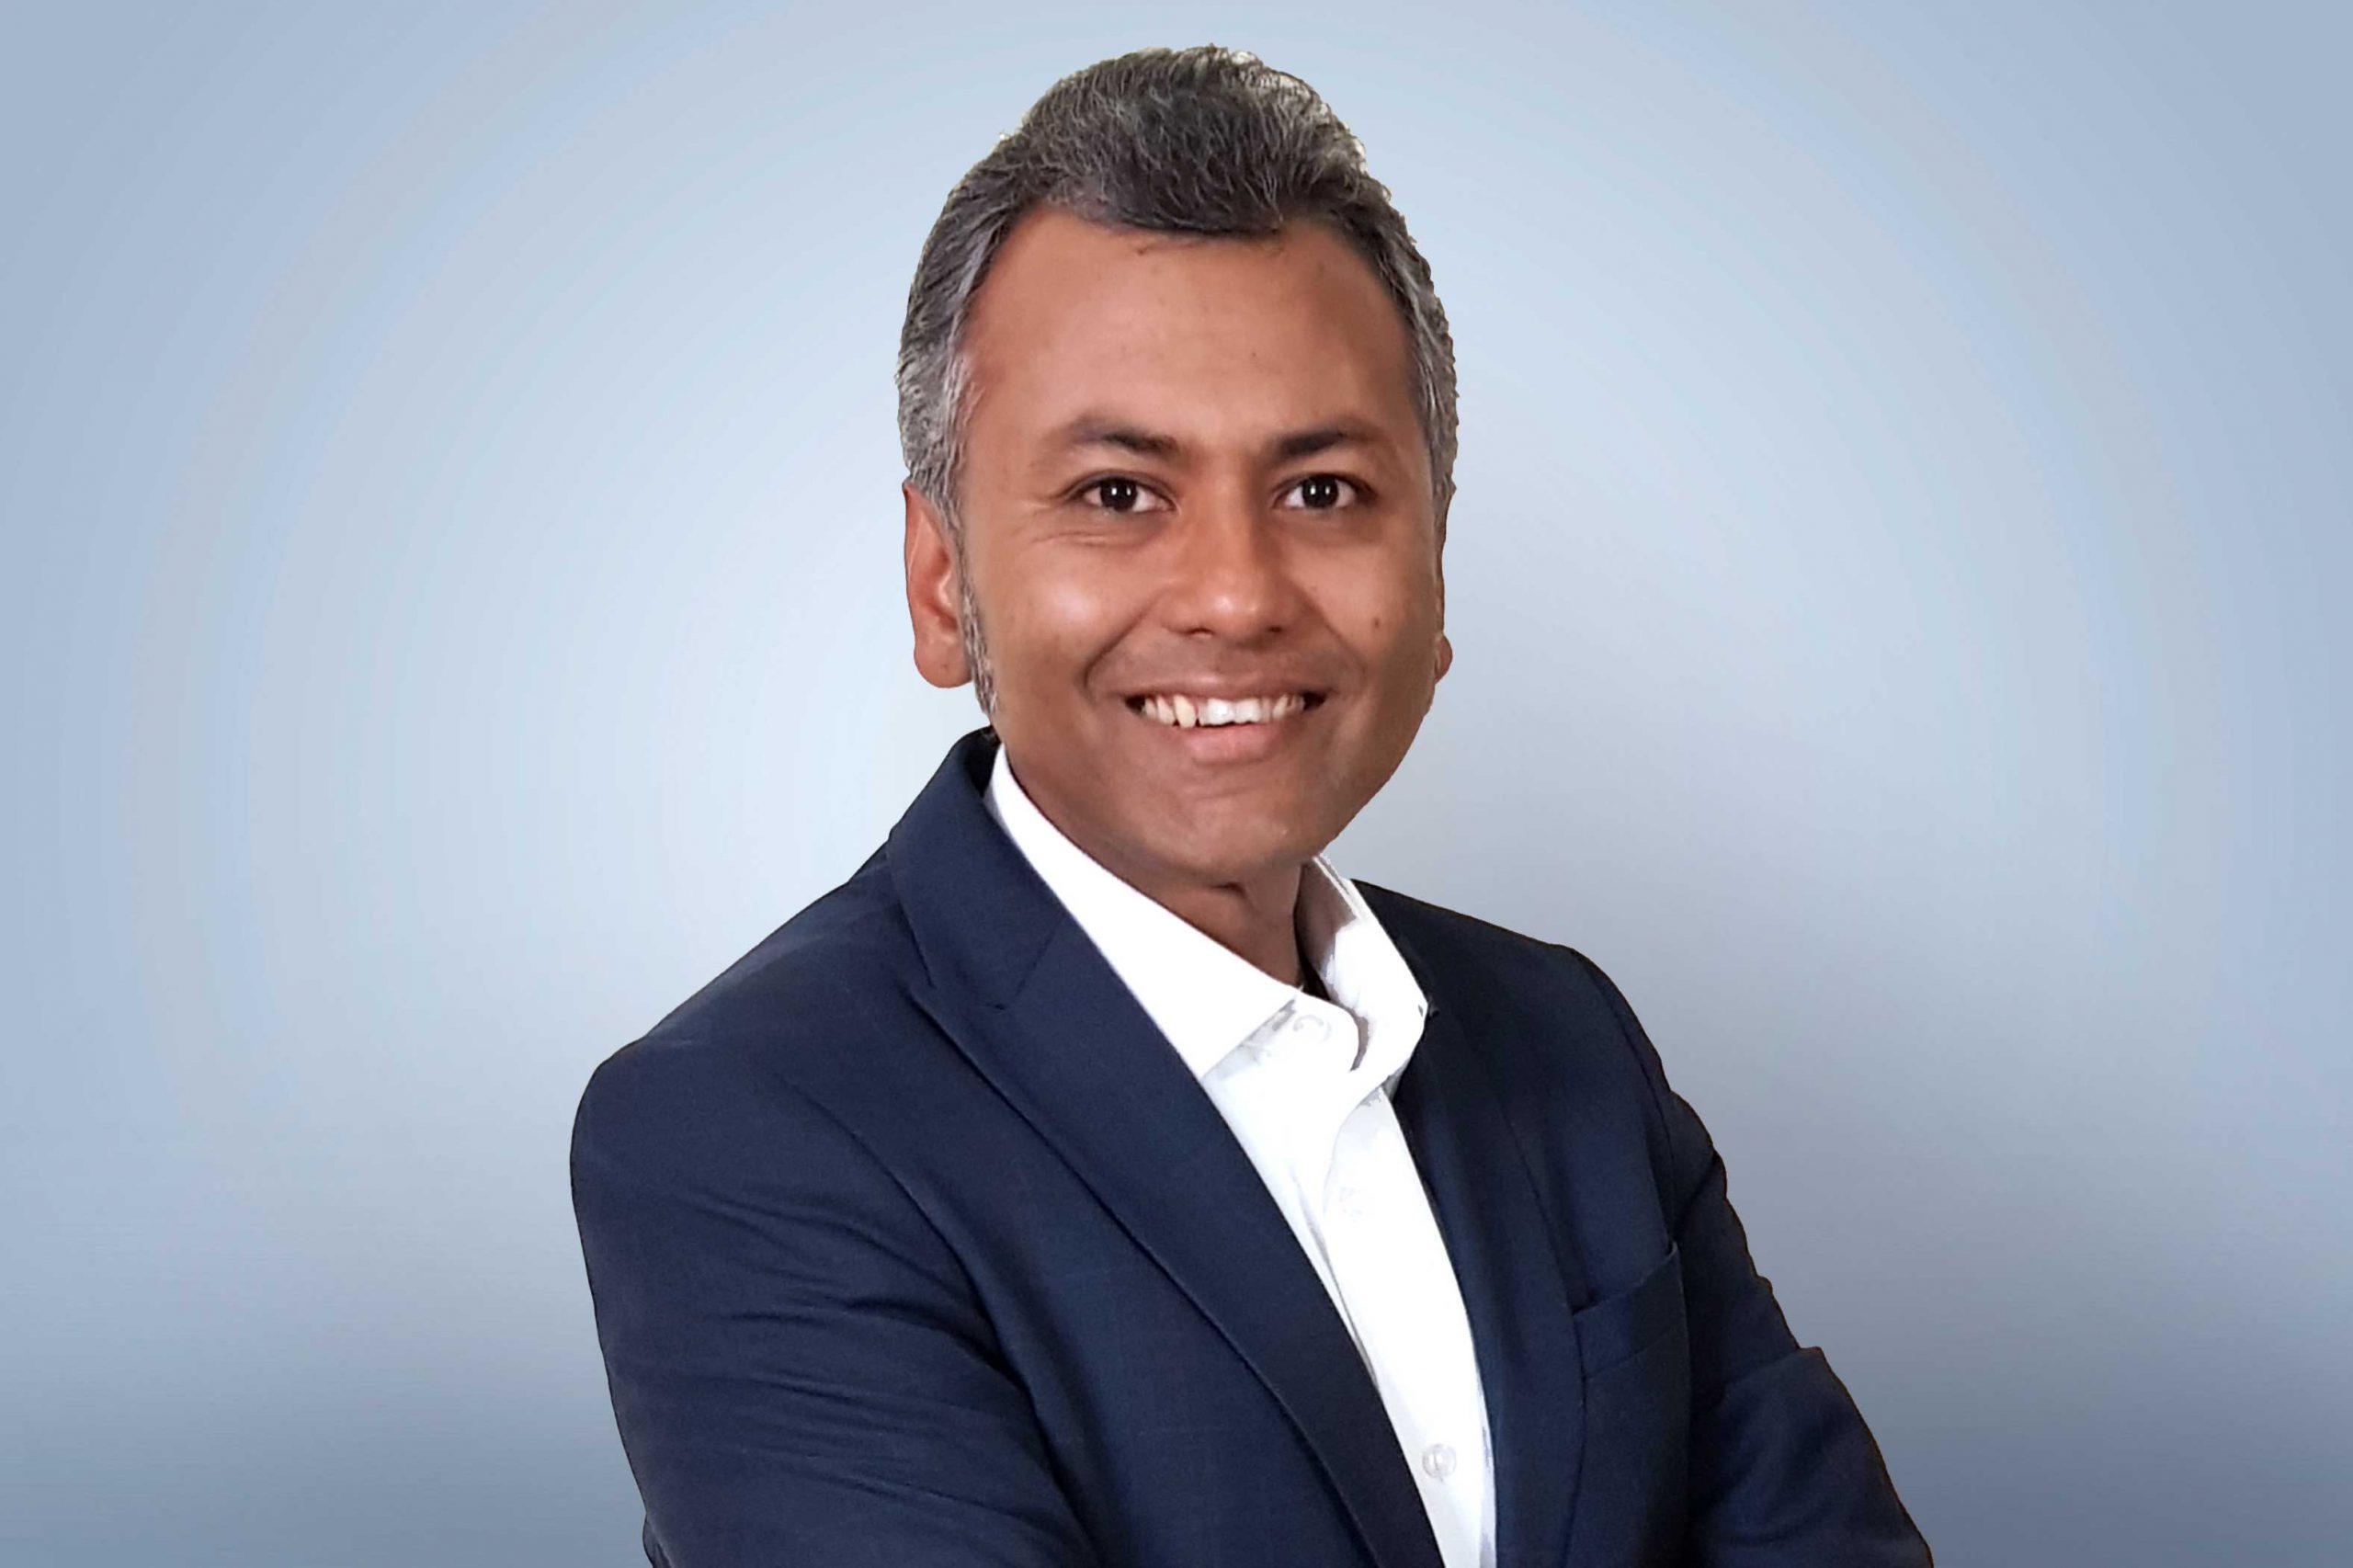 Mr. Rajesh Sethuraman